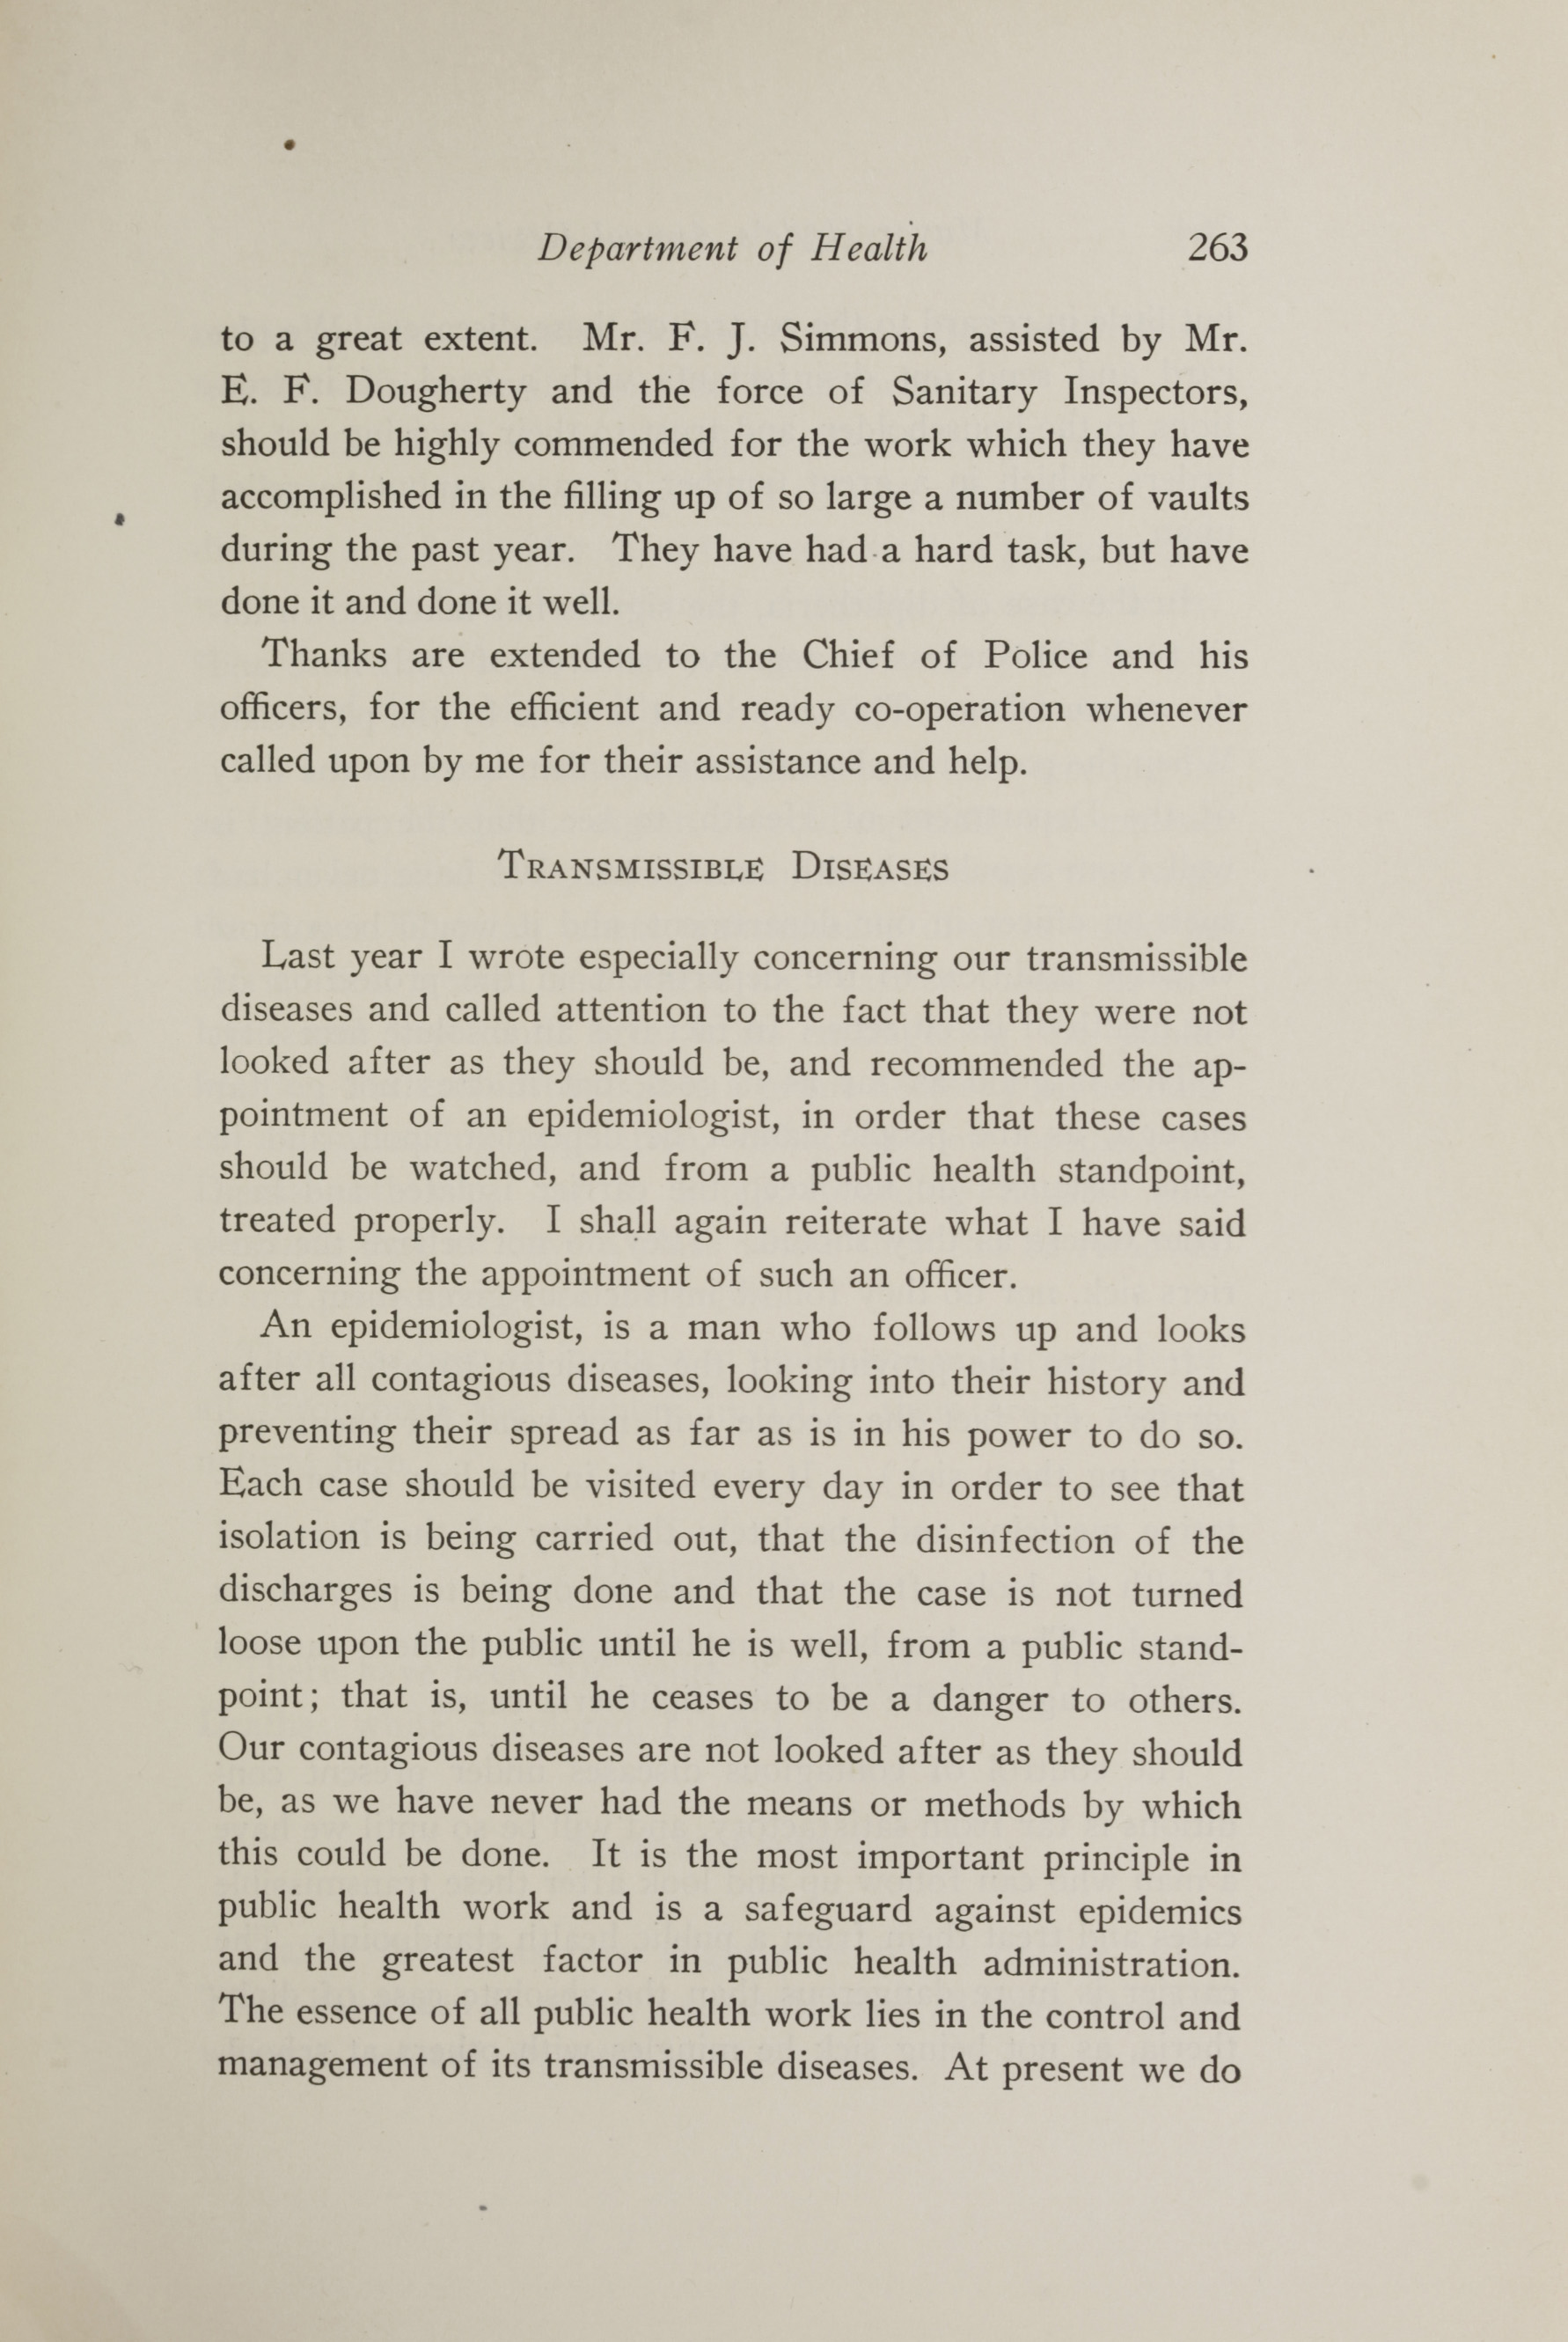 Charleston Yearbook, 1917, page 263